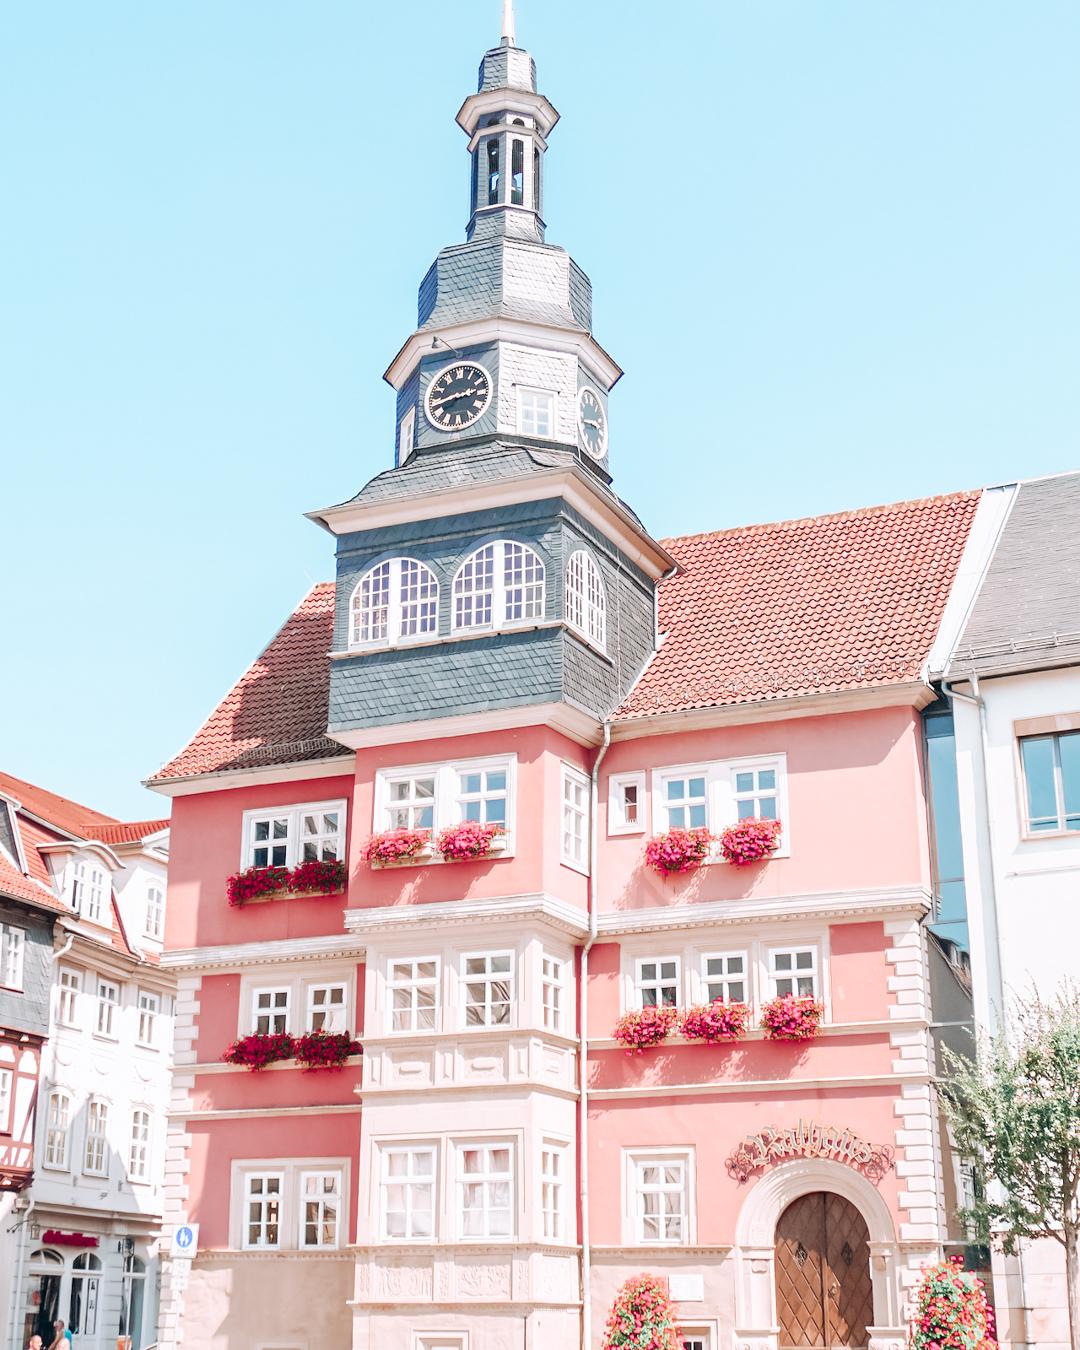 A pink building in Eisenach